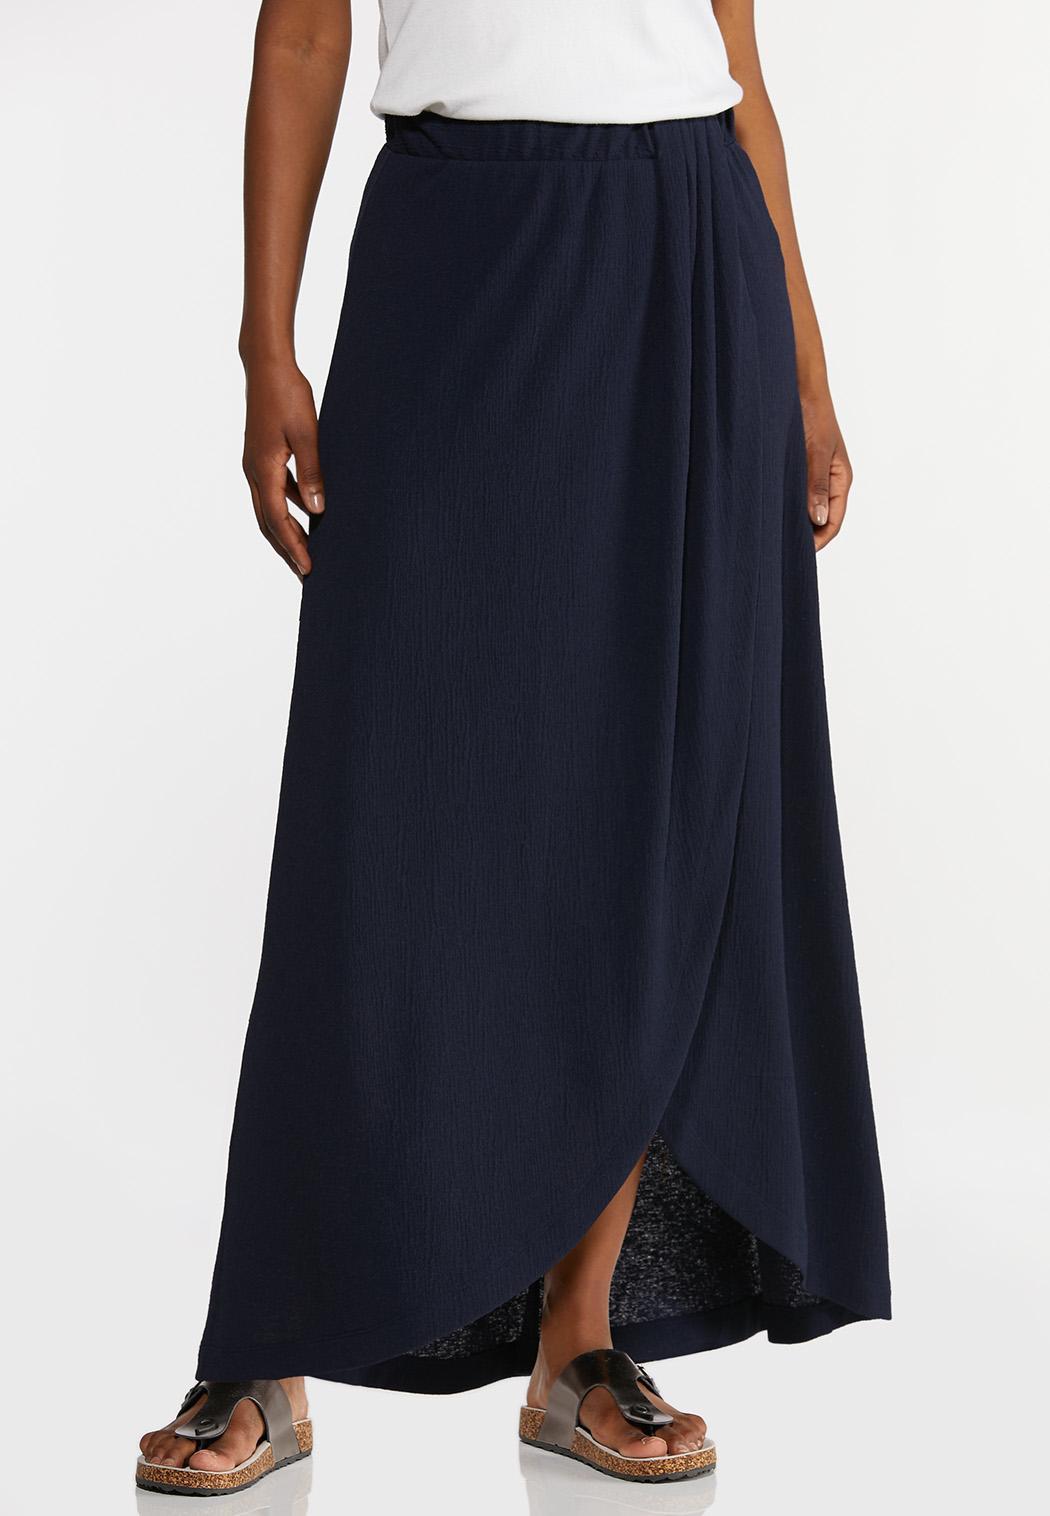 Plus Size Textured Navy Maxi Skirt